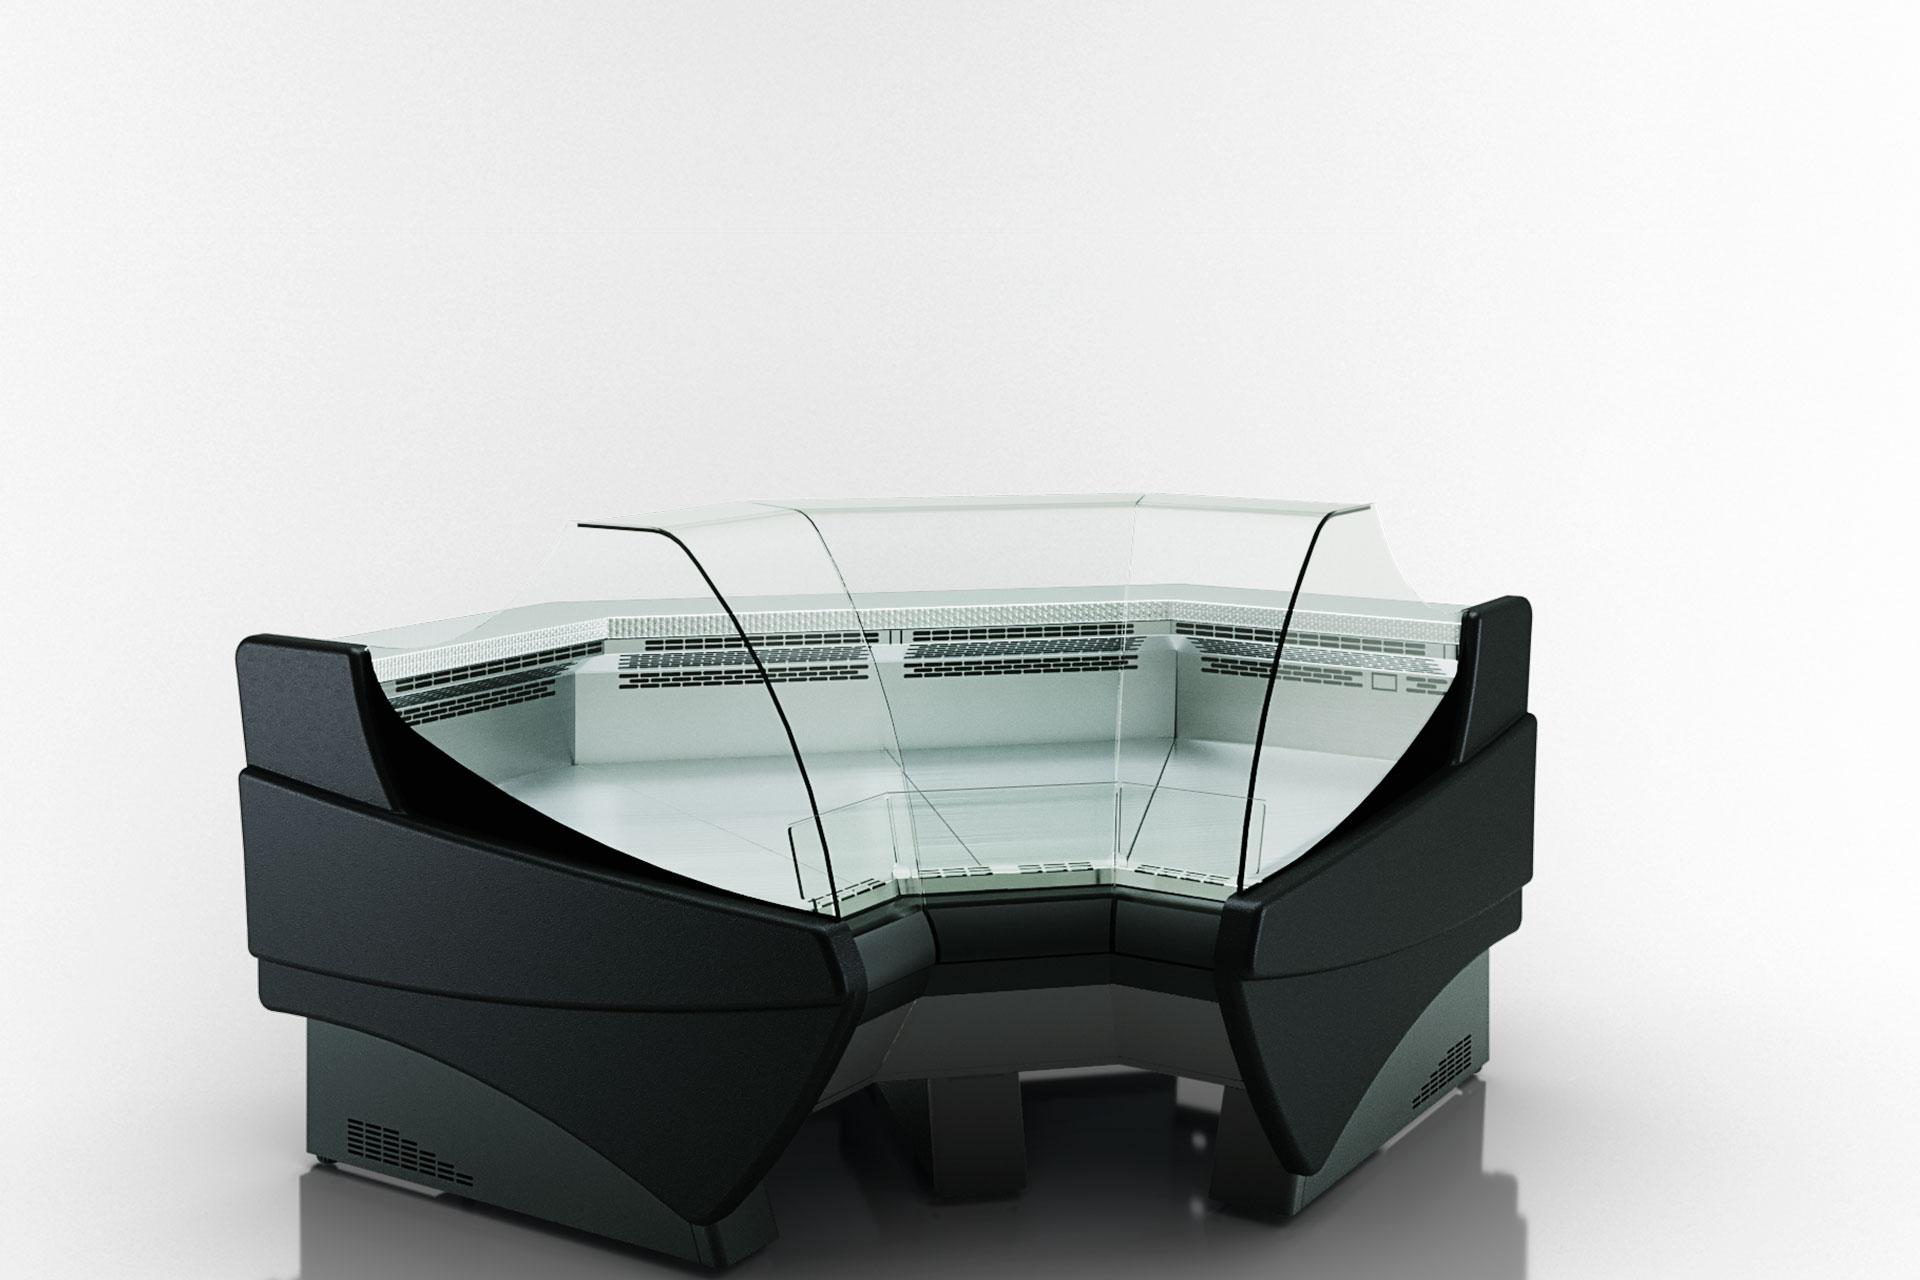 Вітрина Symphony luxe MG 120 deli T 110-DLM-IS90